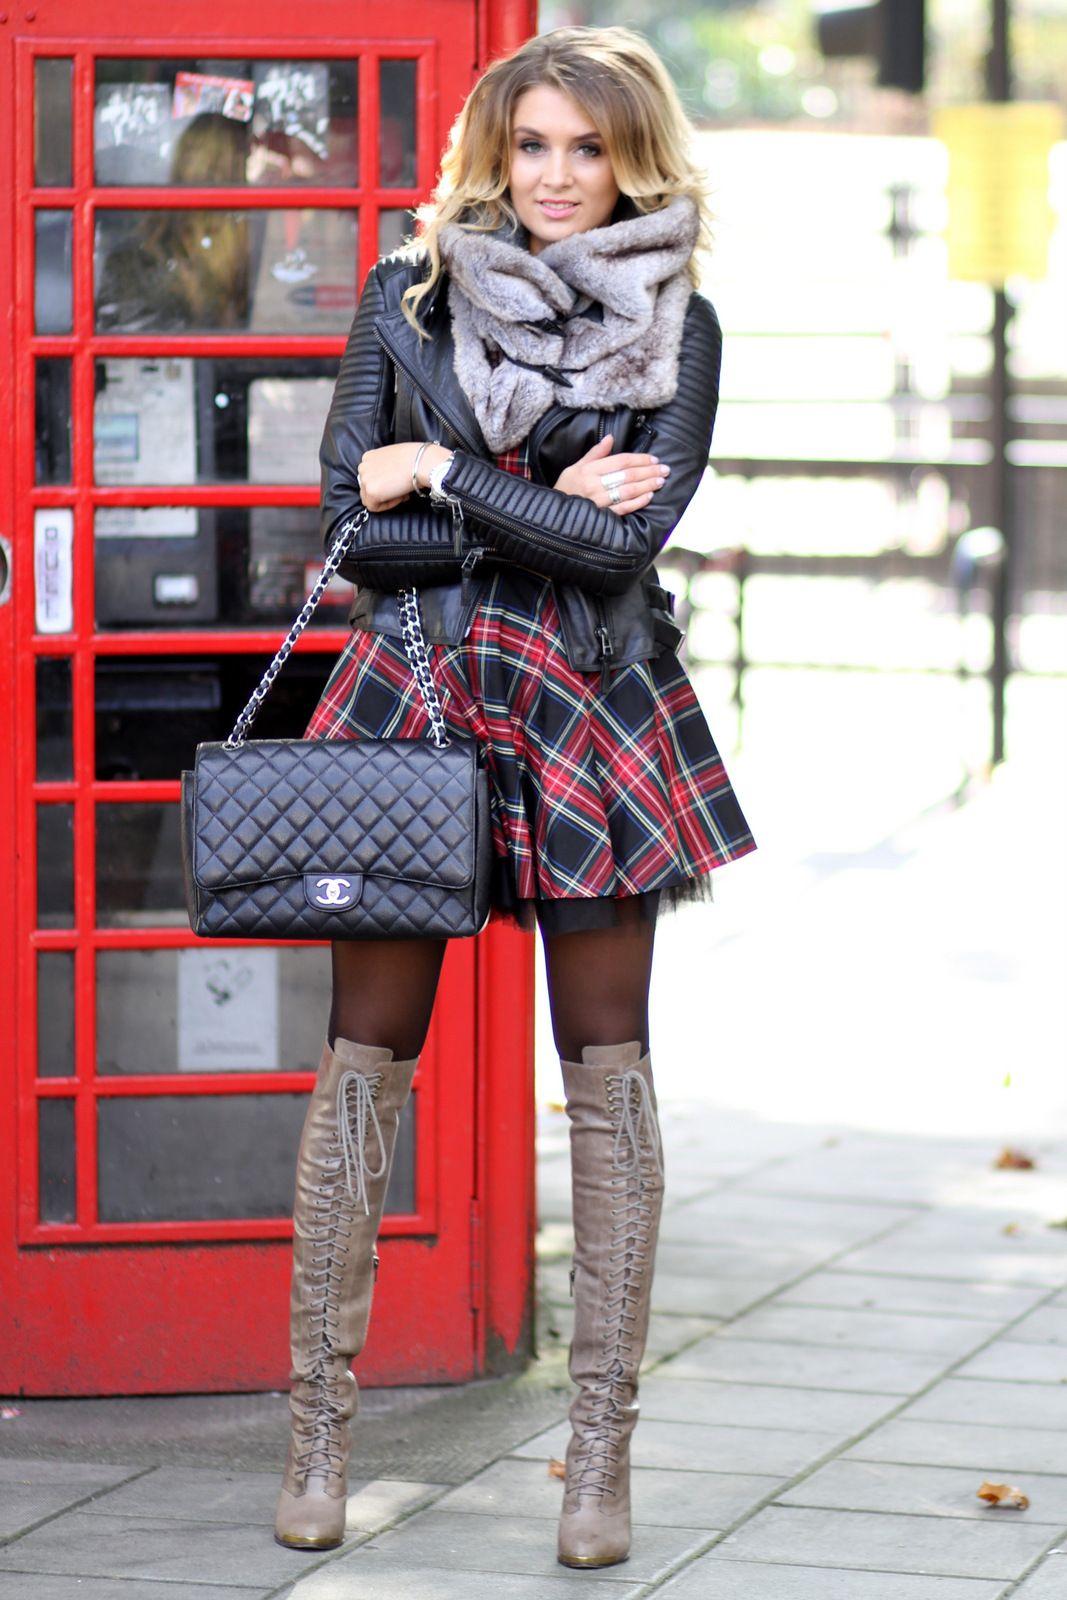 Boots: Joie , Dress: River Island, Bag: Chanel, Jacket: Zara